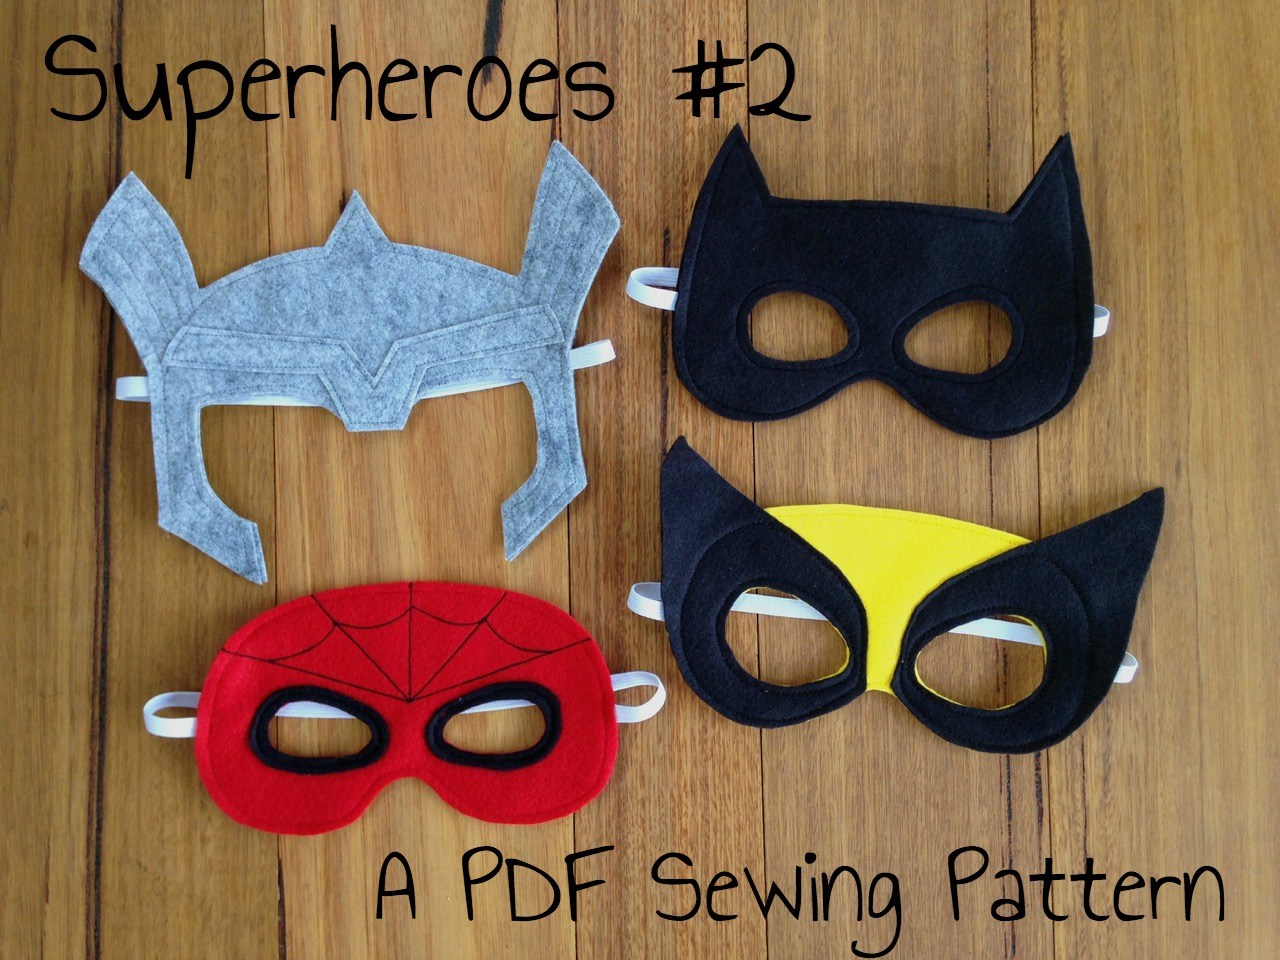 Superhero Masks - Spiderman, Thor, Wolverine and Batman Costumes (en)